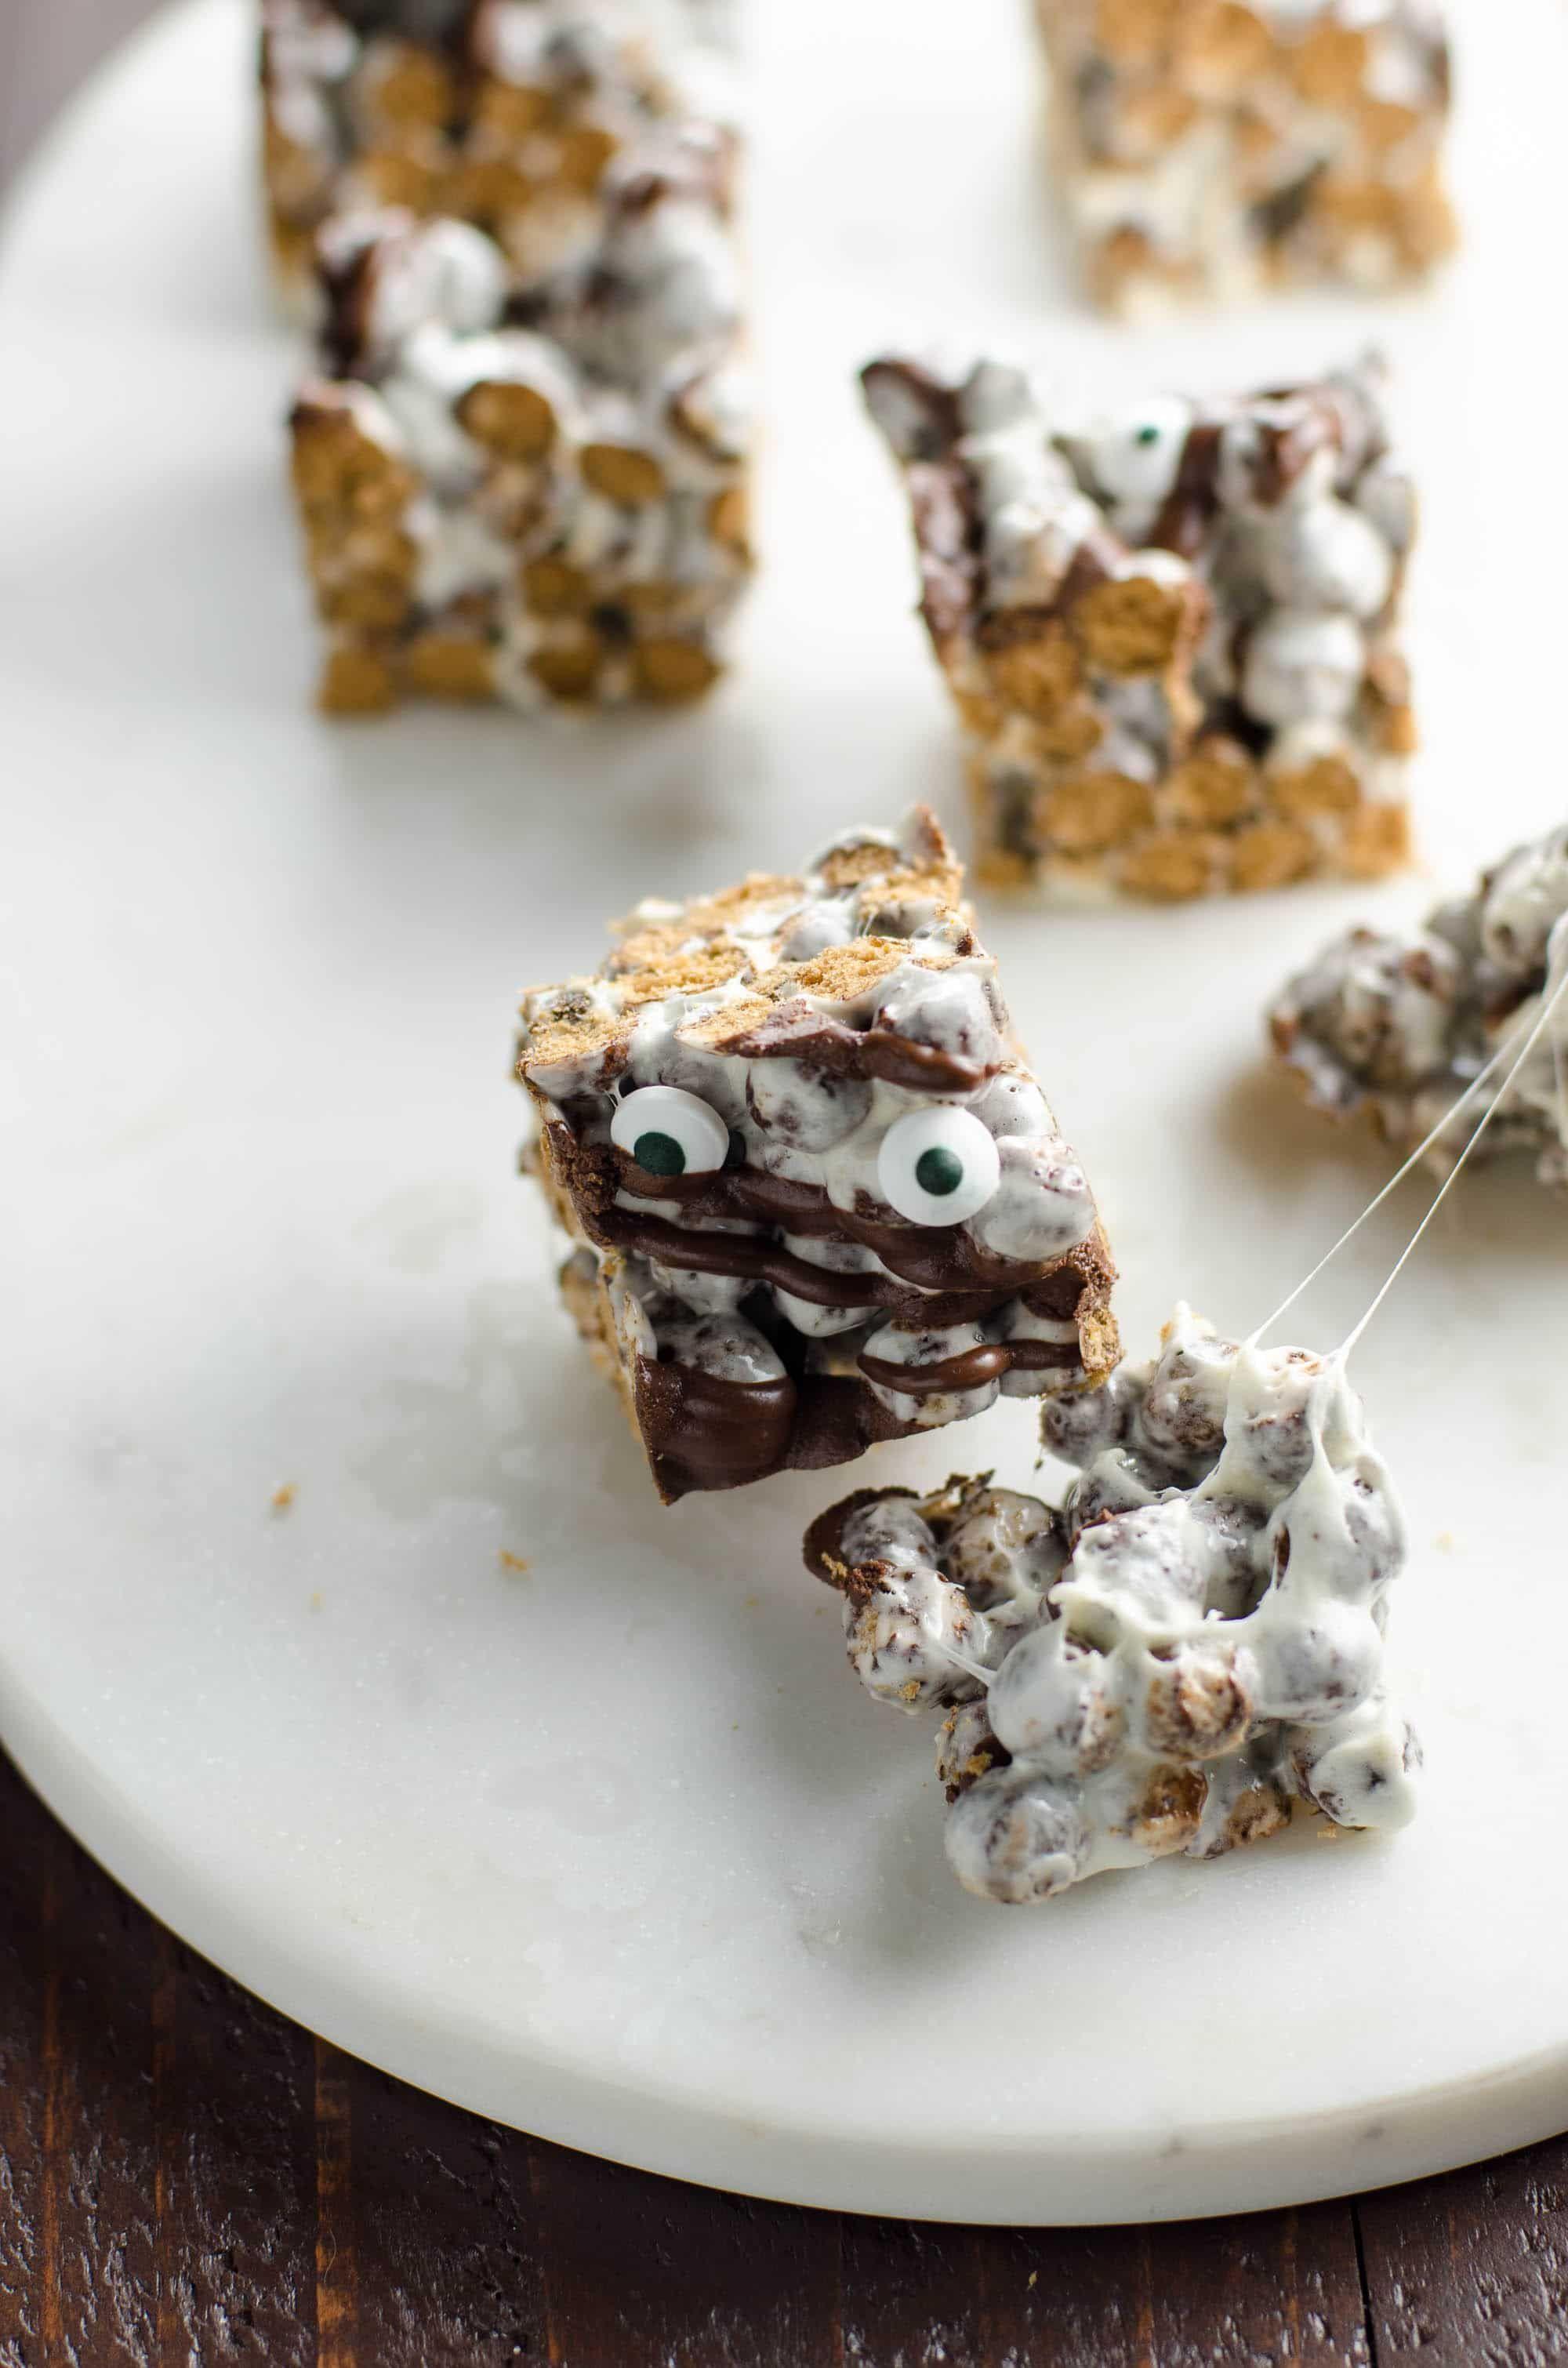 Halloween Cocoa Puff Marshmallow Treats Recipe